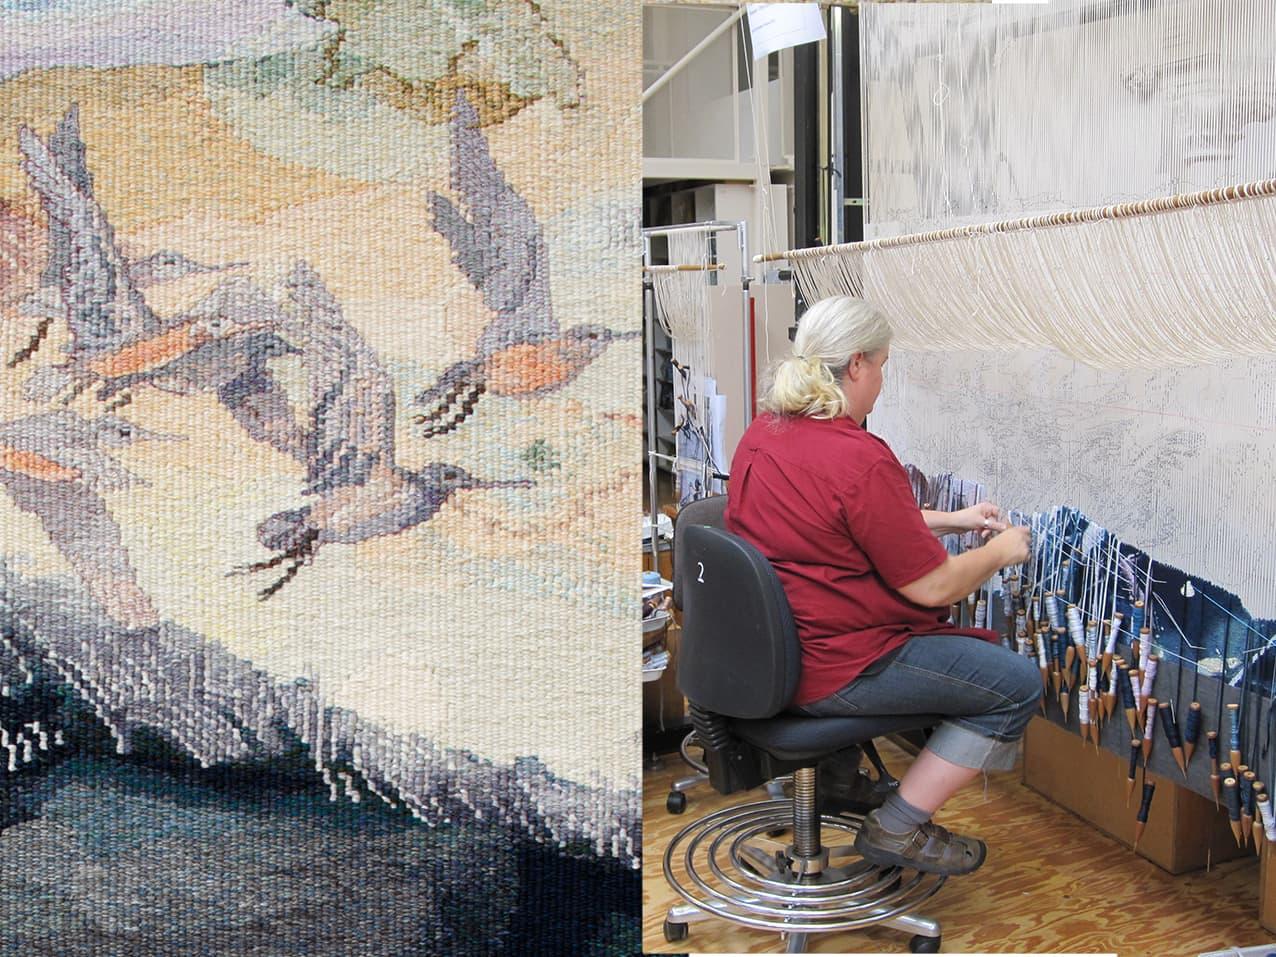 Progress shots of 'Concerning the wading birds of the Warrnambool wetlands' 2012, designed by John Wolseley, woven by Chris Cochius, Pamela Joyce & Milena Paplinska, wool and cotton, 1.80 x 1.90m. Photographs: ATW.